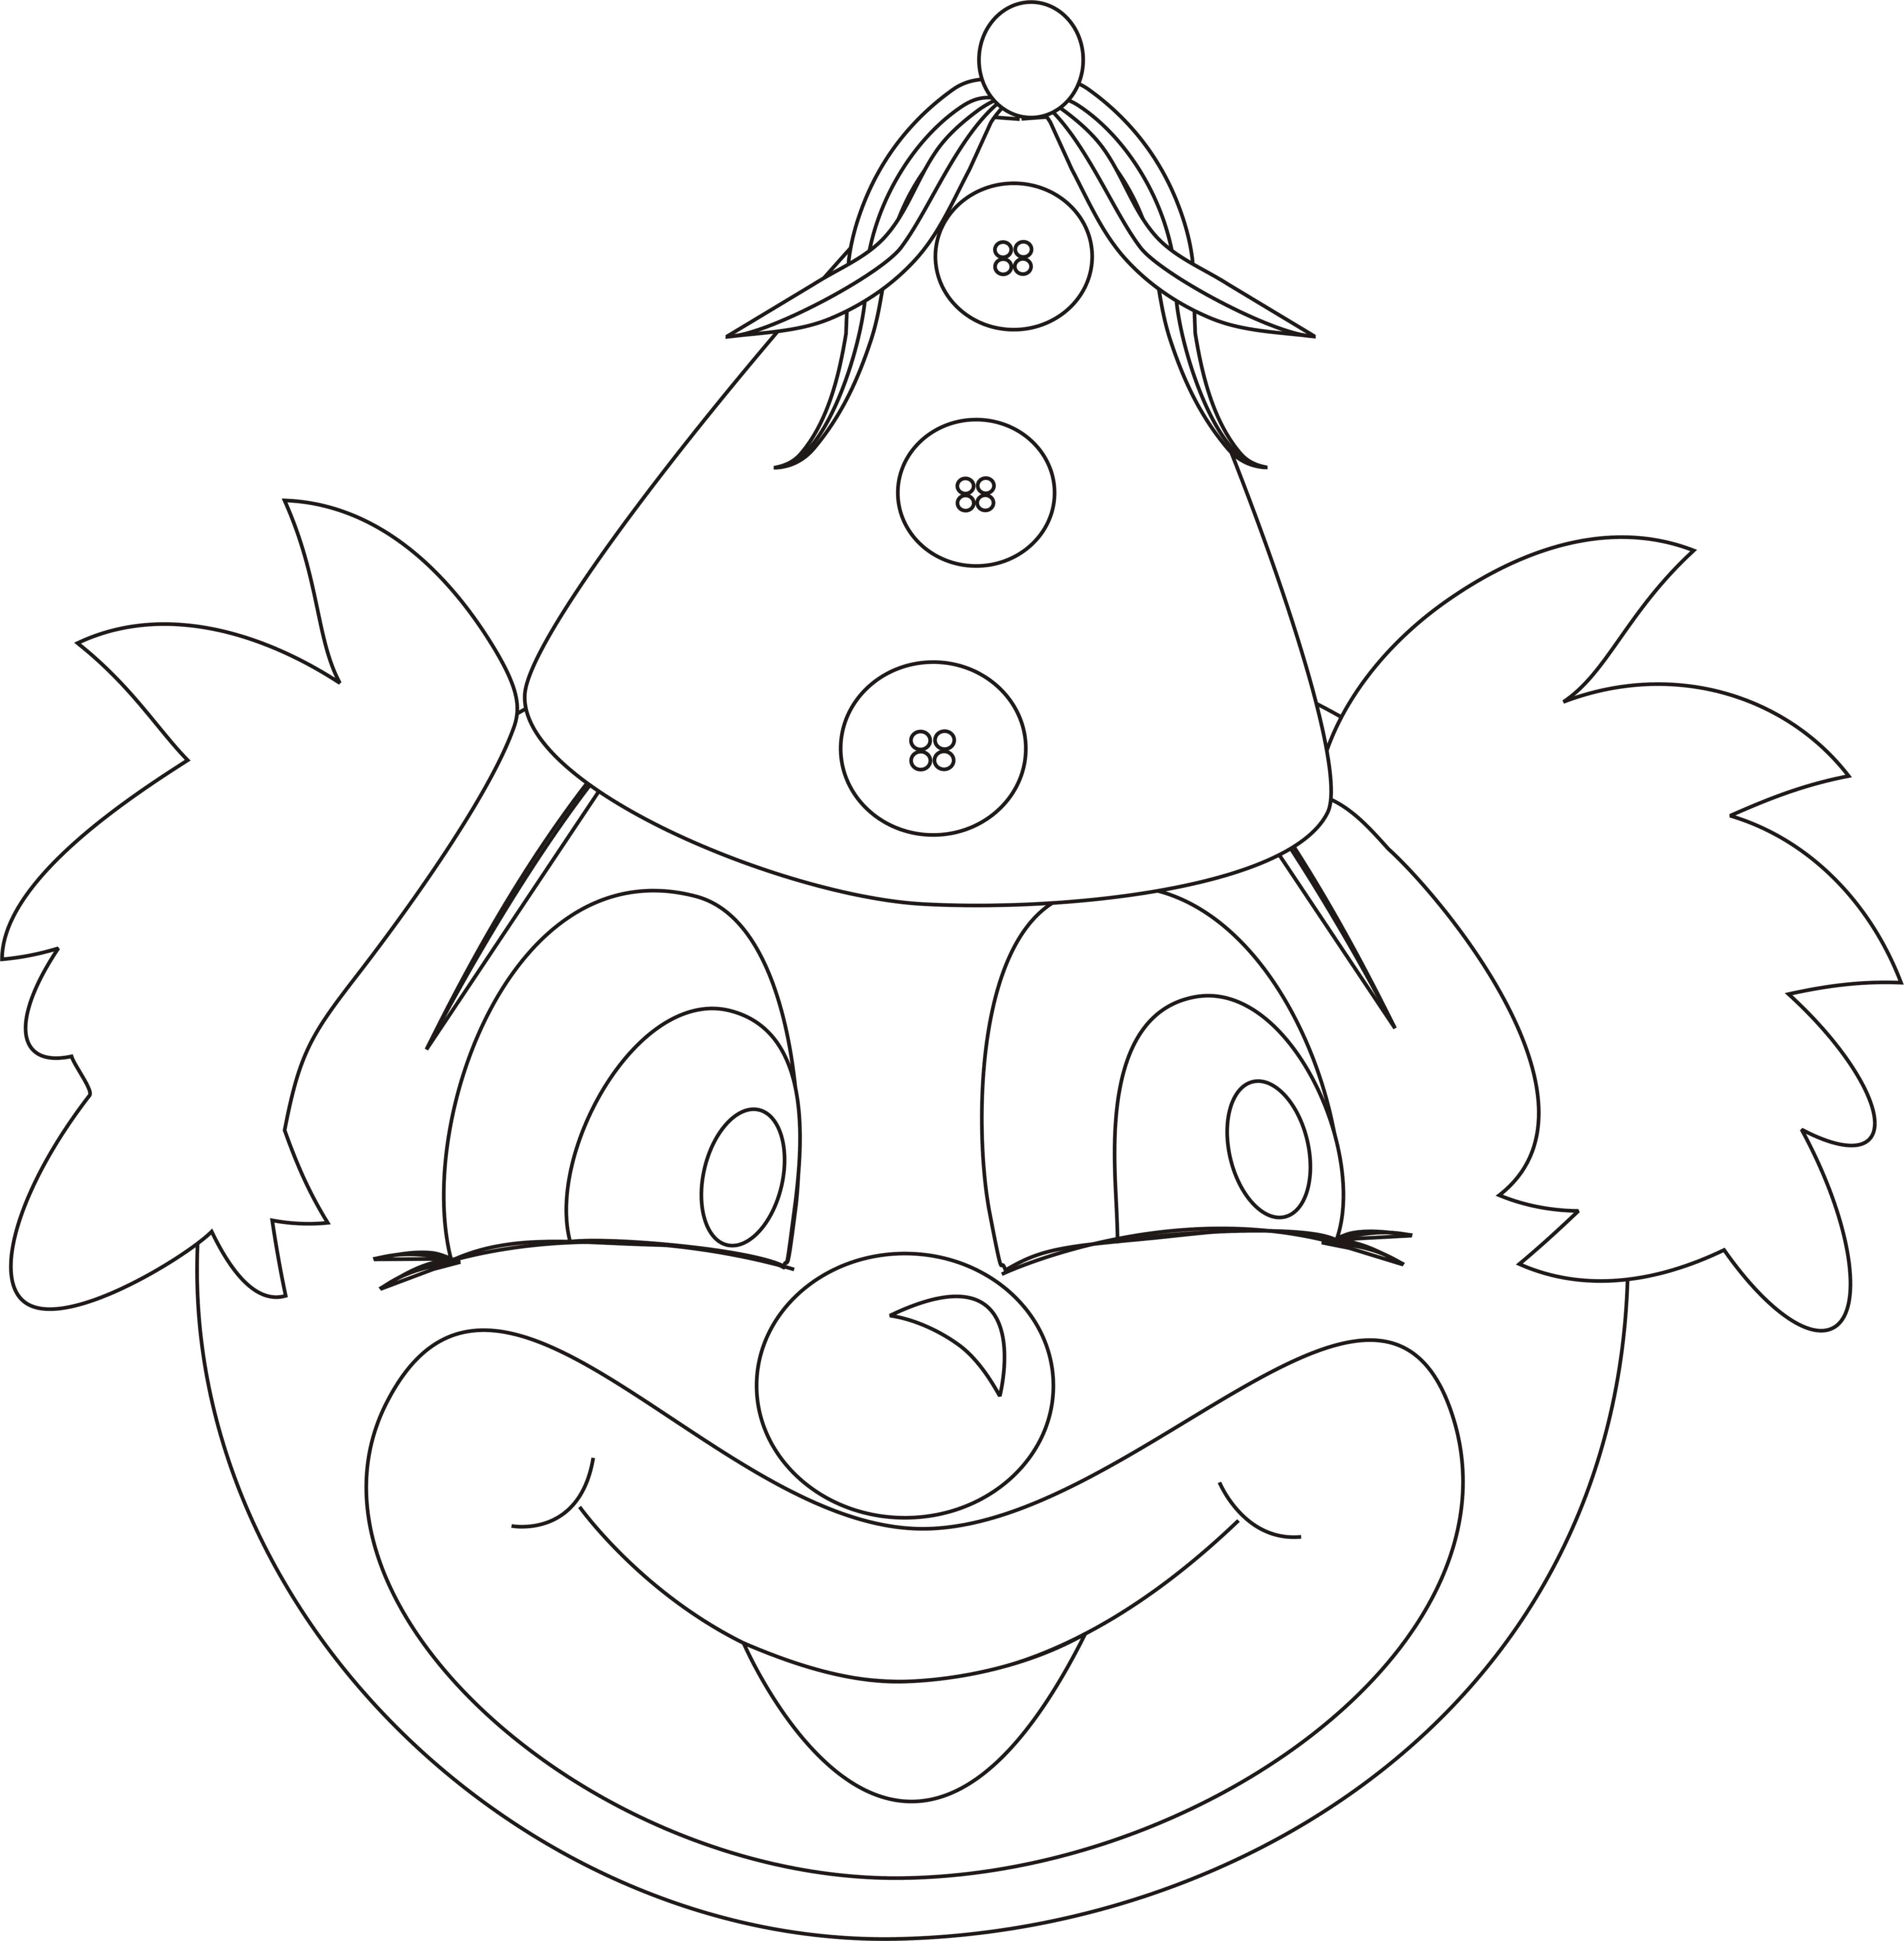 Раскраска Мордашка клоуна. Скачать клоун.  Распечатать клоун